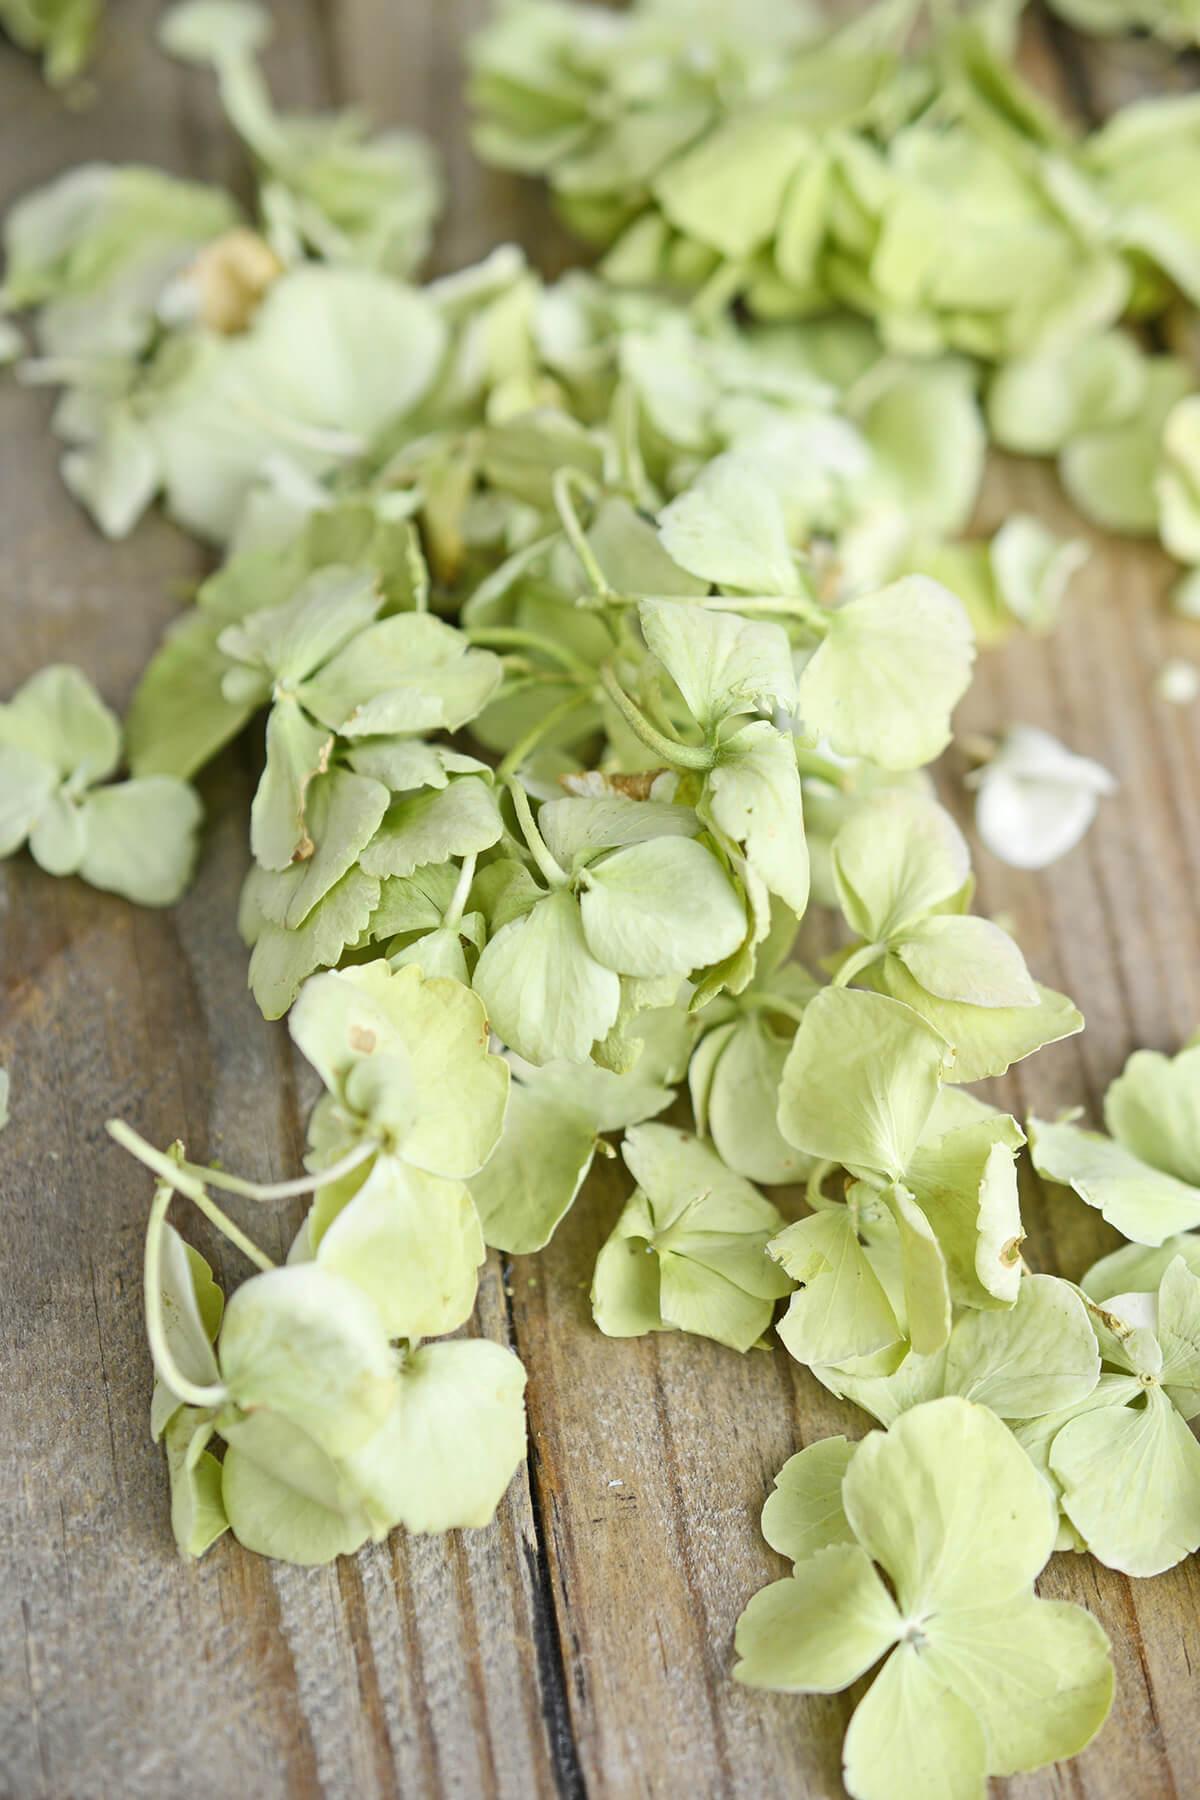 Eco Friendly Preserved Green Hydrangea Petals- 5 cups